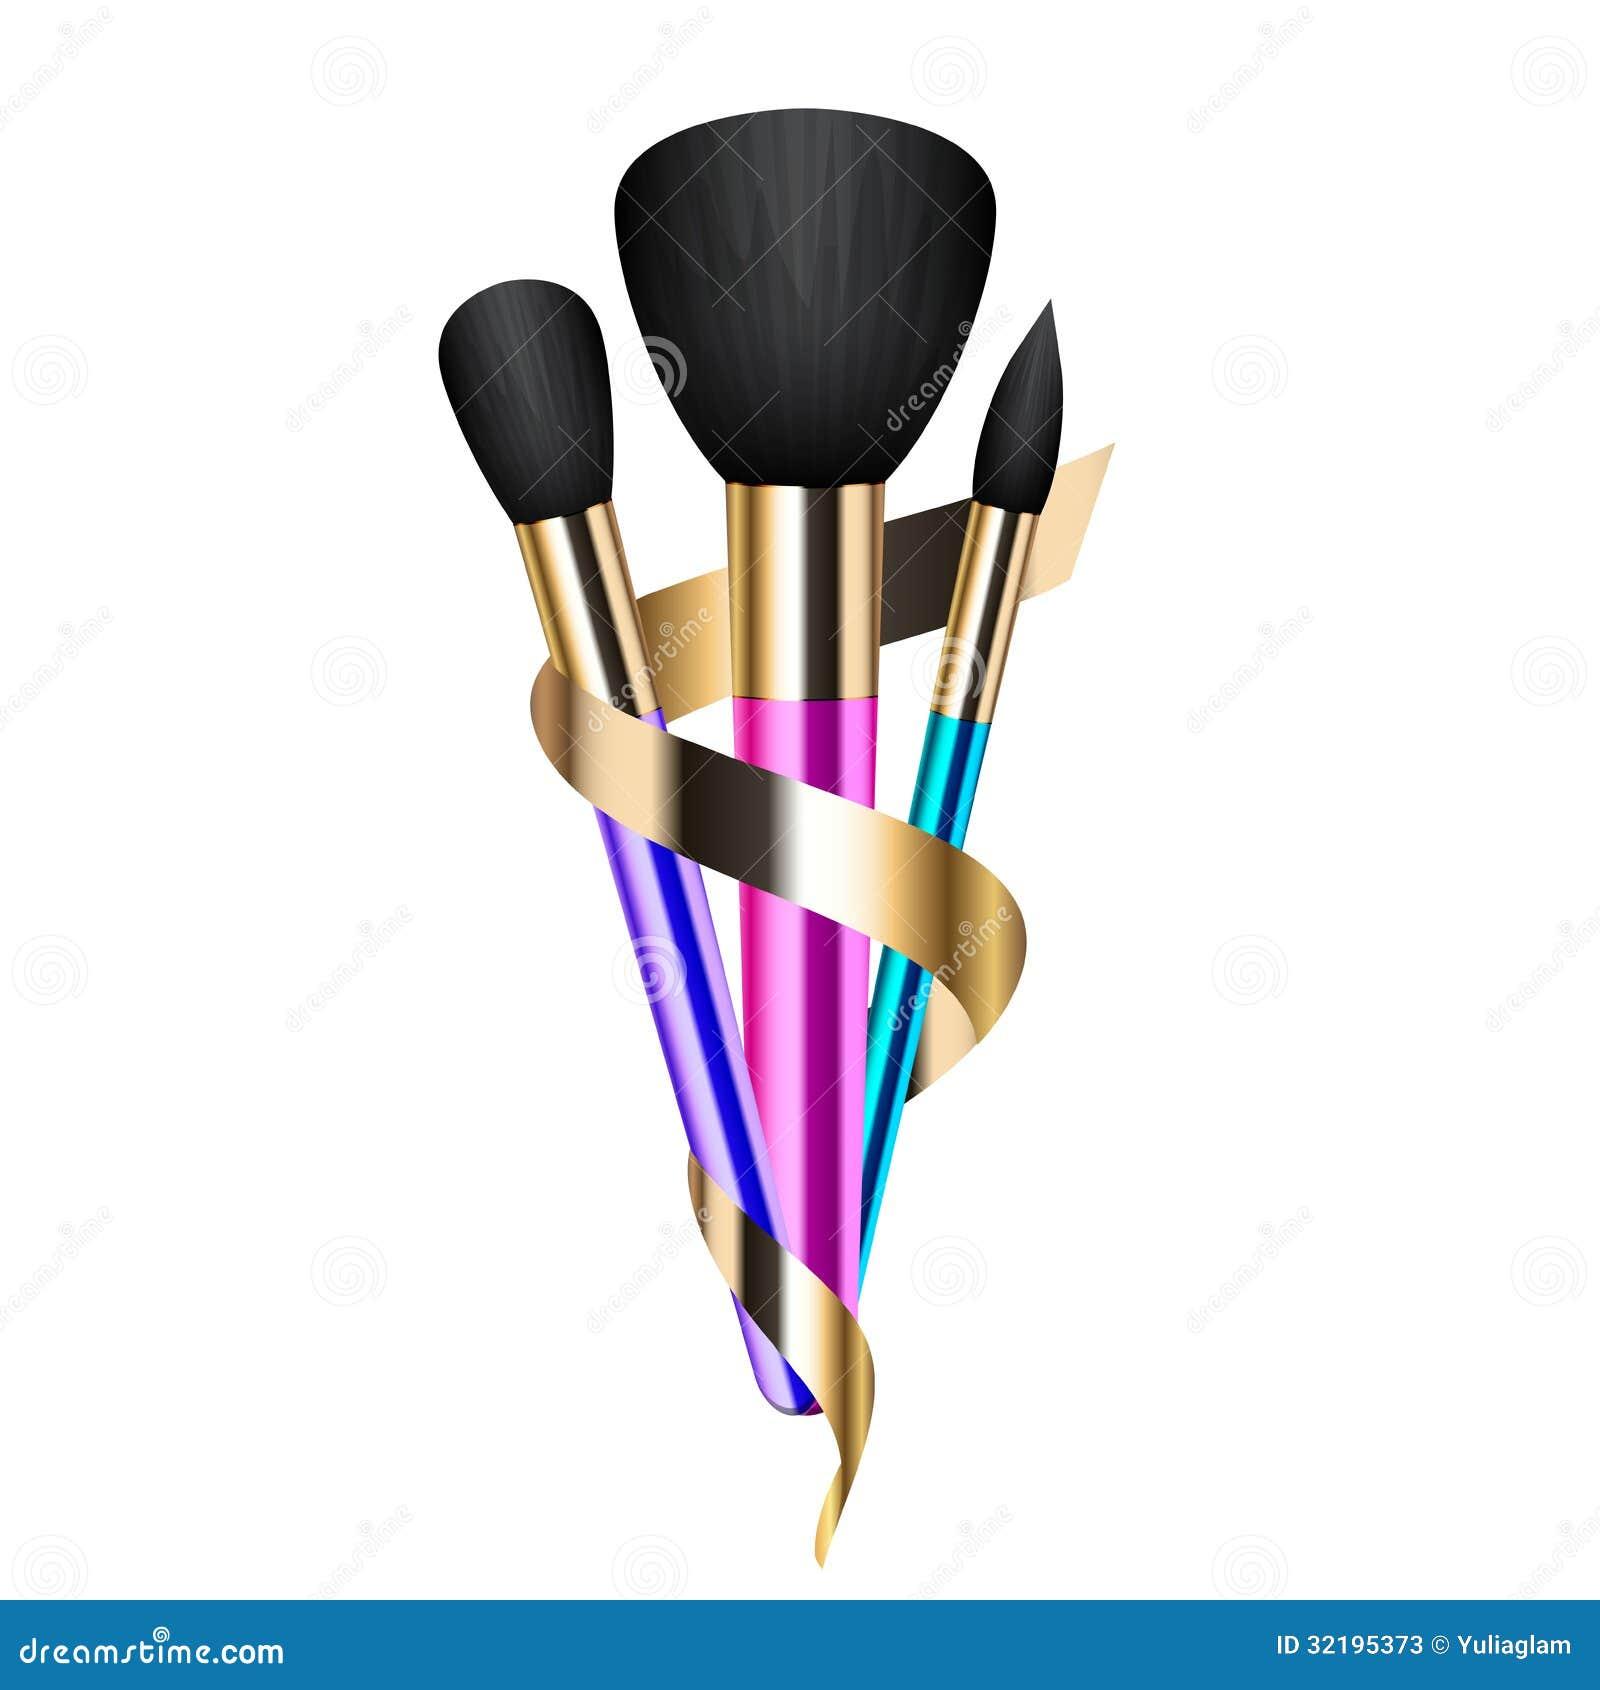 Colorful Make Up Brushes Stock Photos Image 32195373